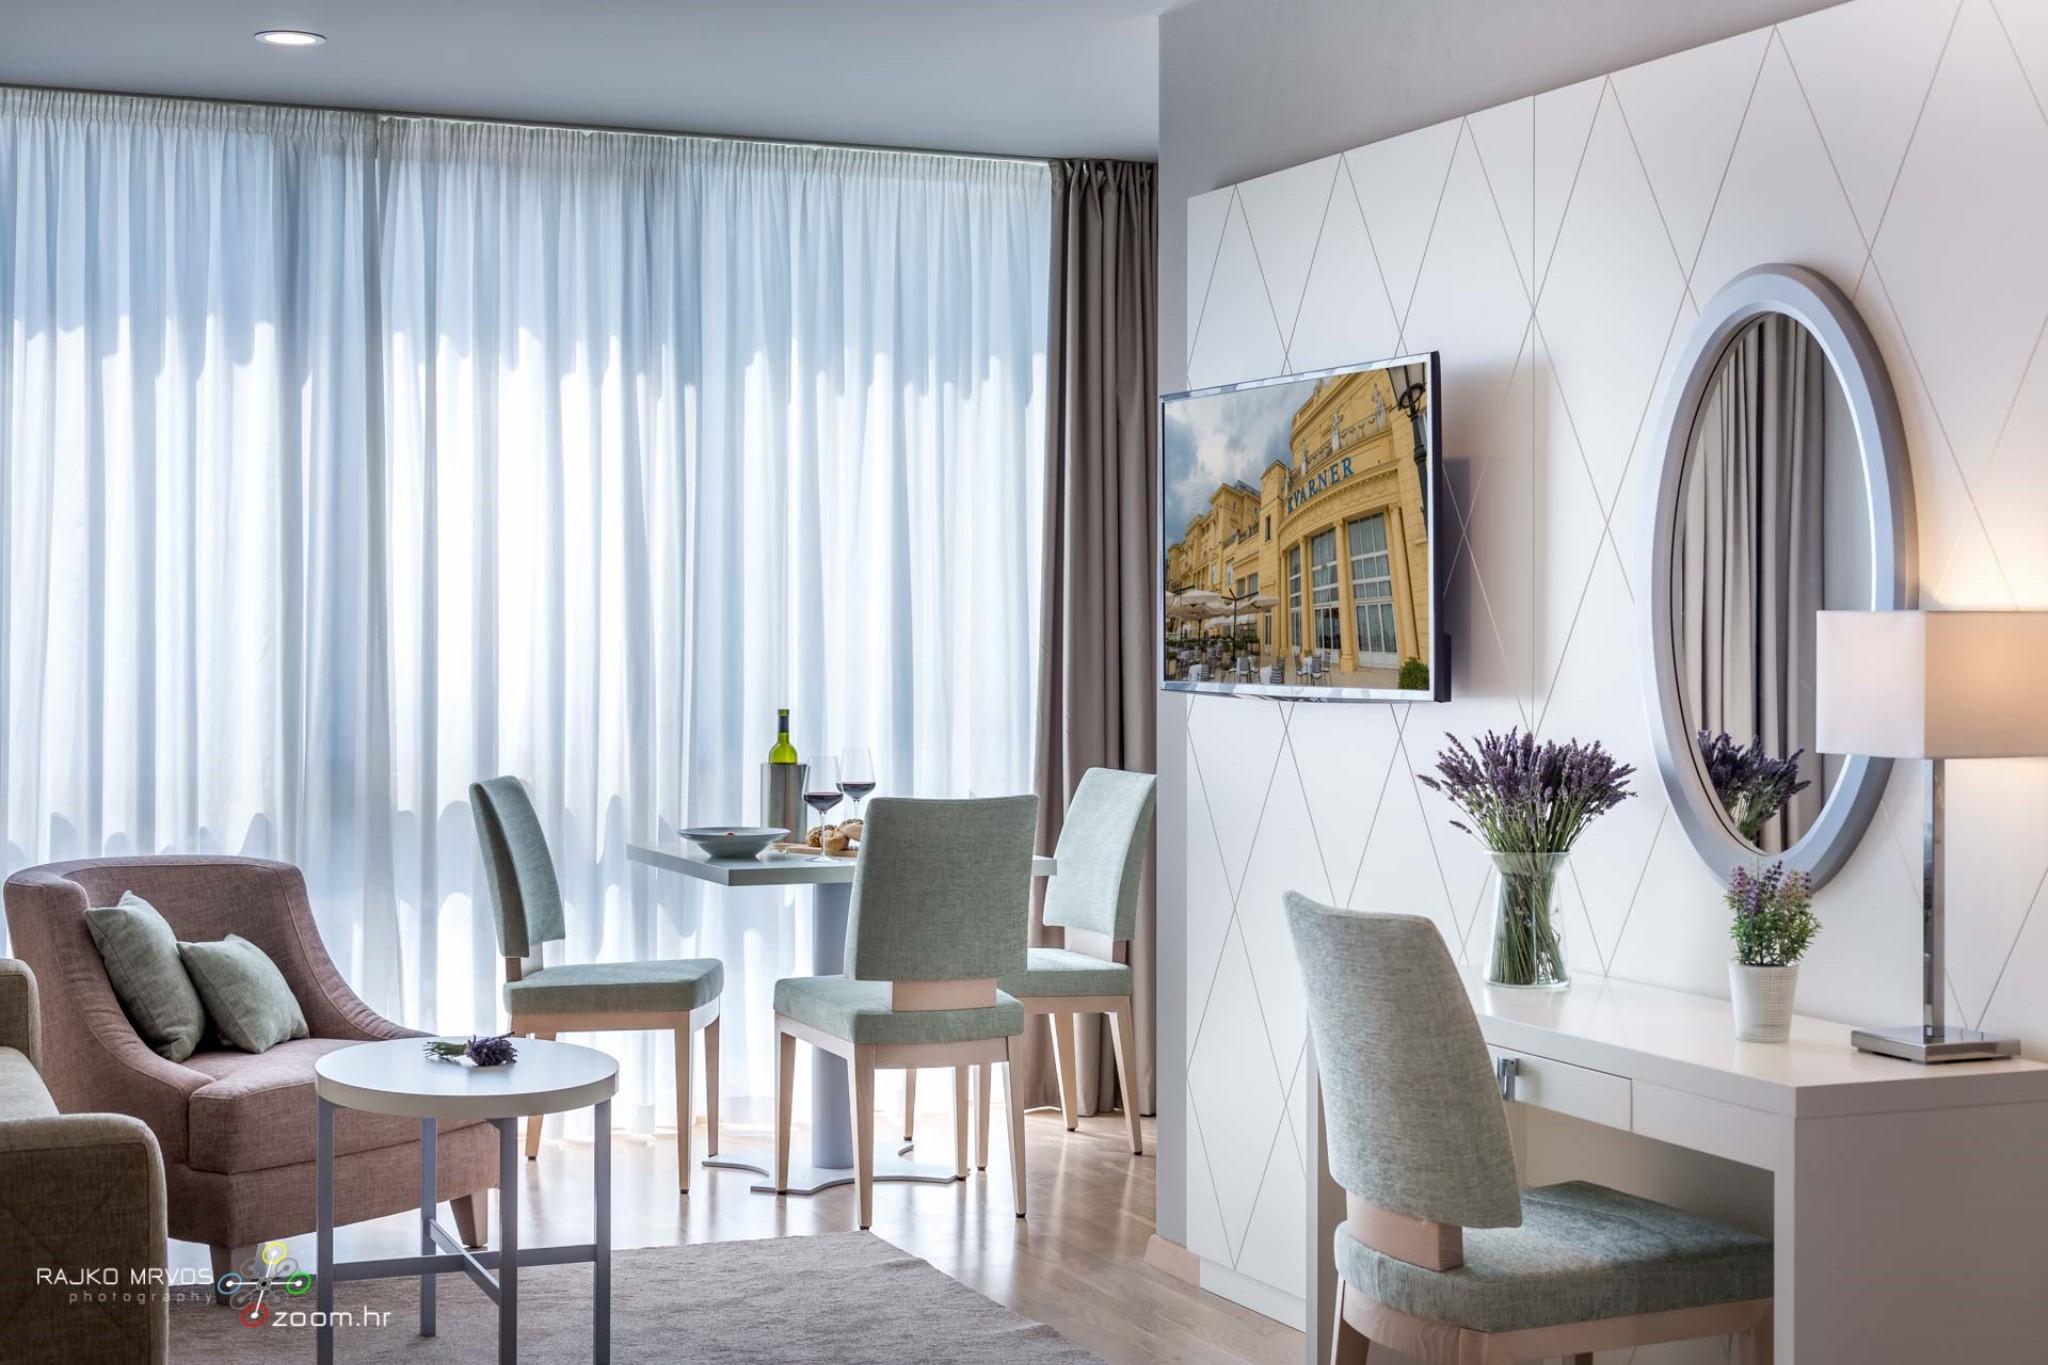 fotografiranje-interijera-fotograf-eksterijera-apartmana-vila-kuca-apartman-Preelook-5